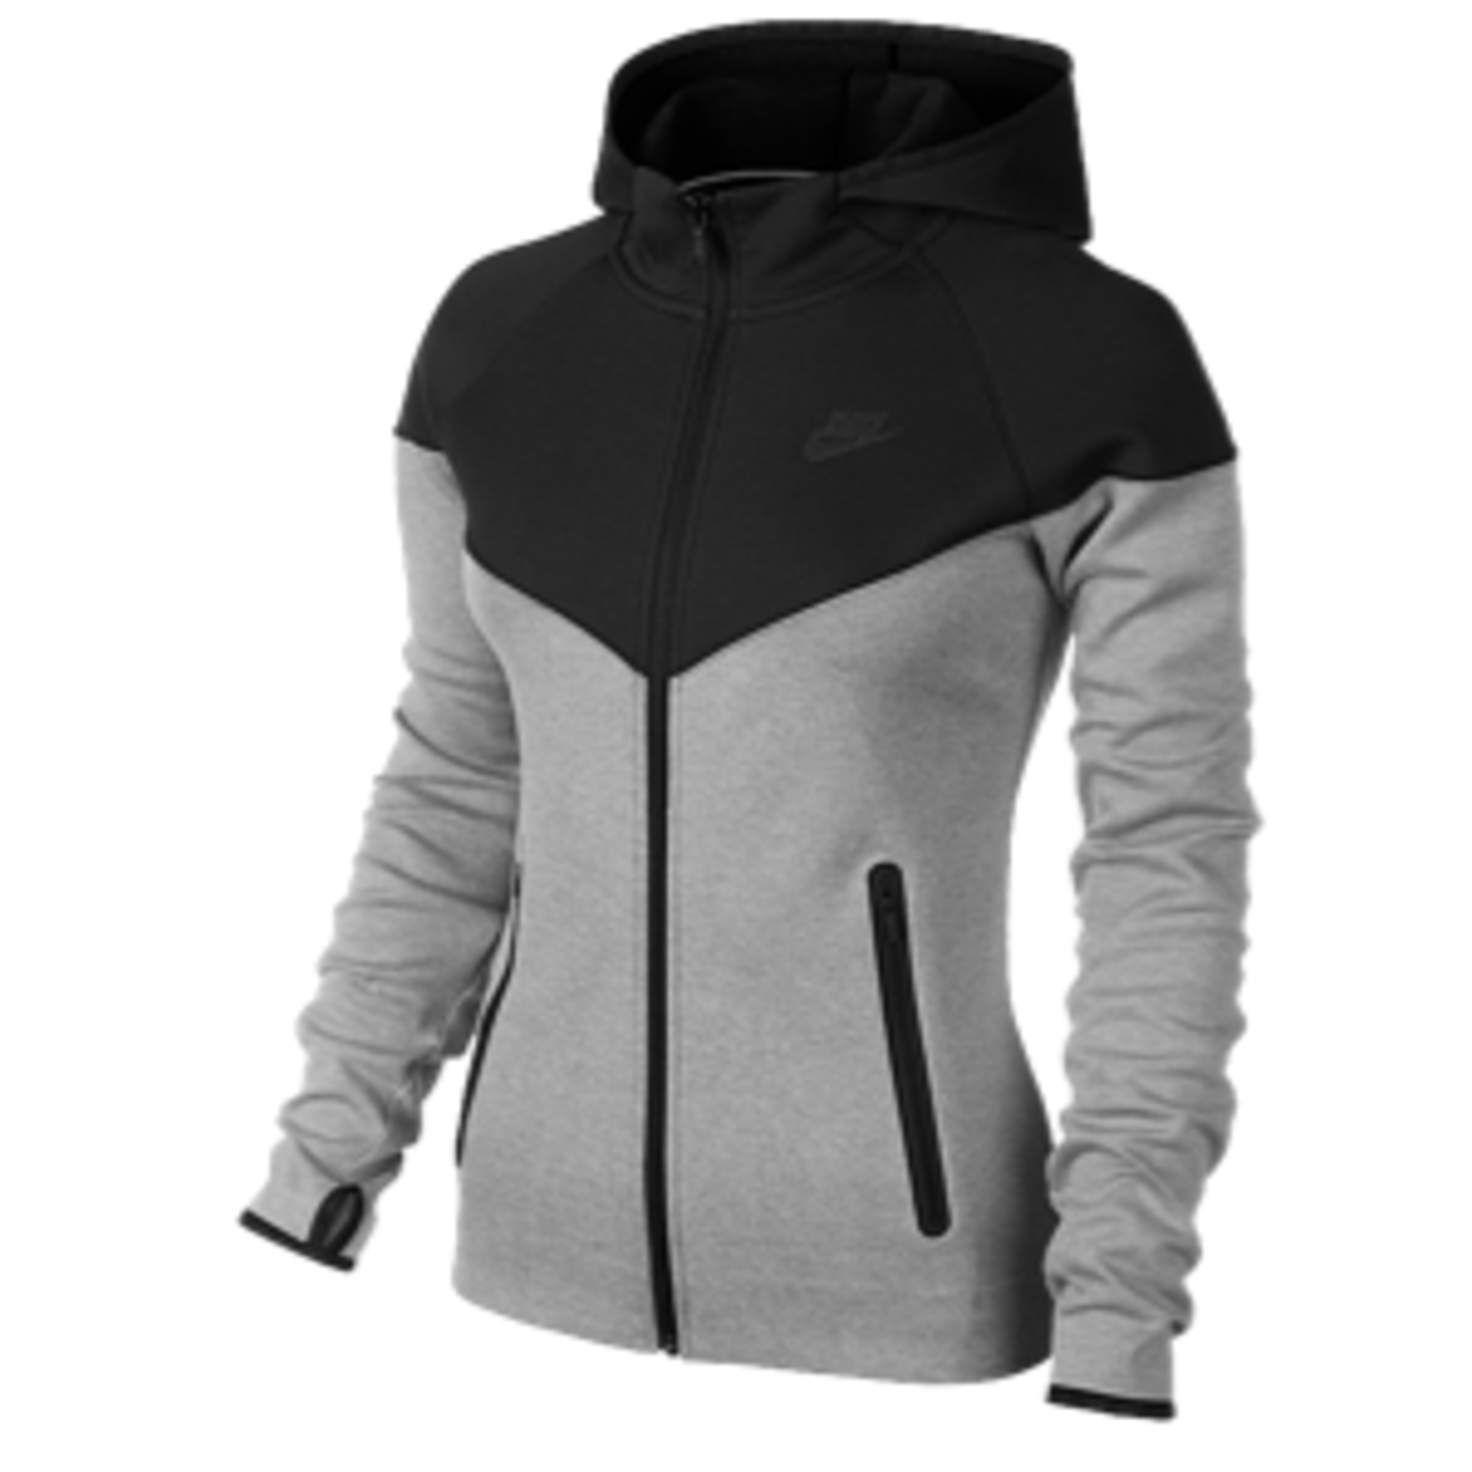 Nike Tech Fleece Full Zip Hoodie Women S Nike Tech Fleece Nike Tech Nike Tech Fleece Windrunner [ 1472 x 1472 Pixel ]